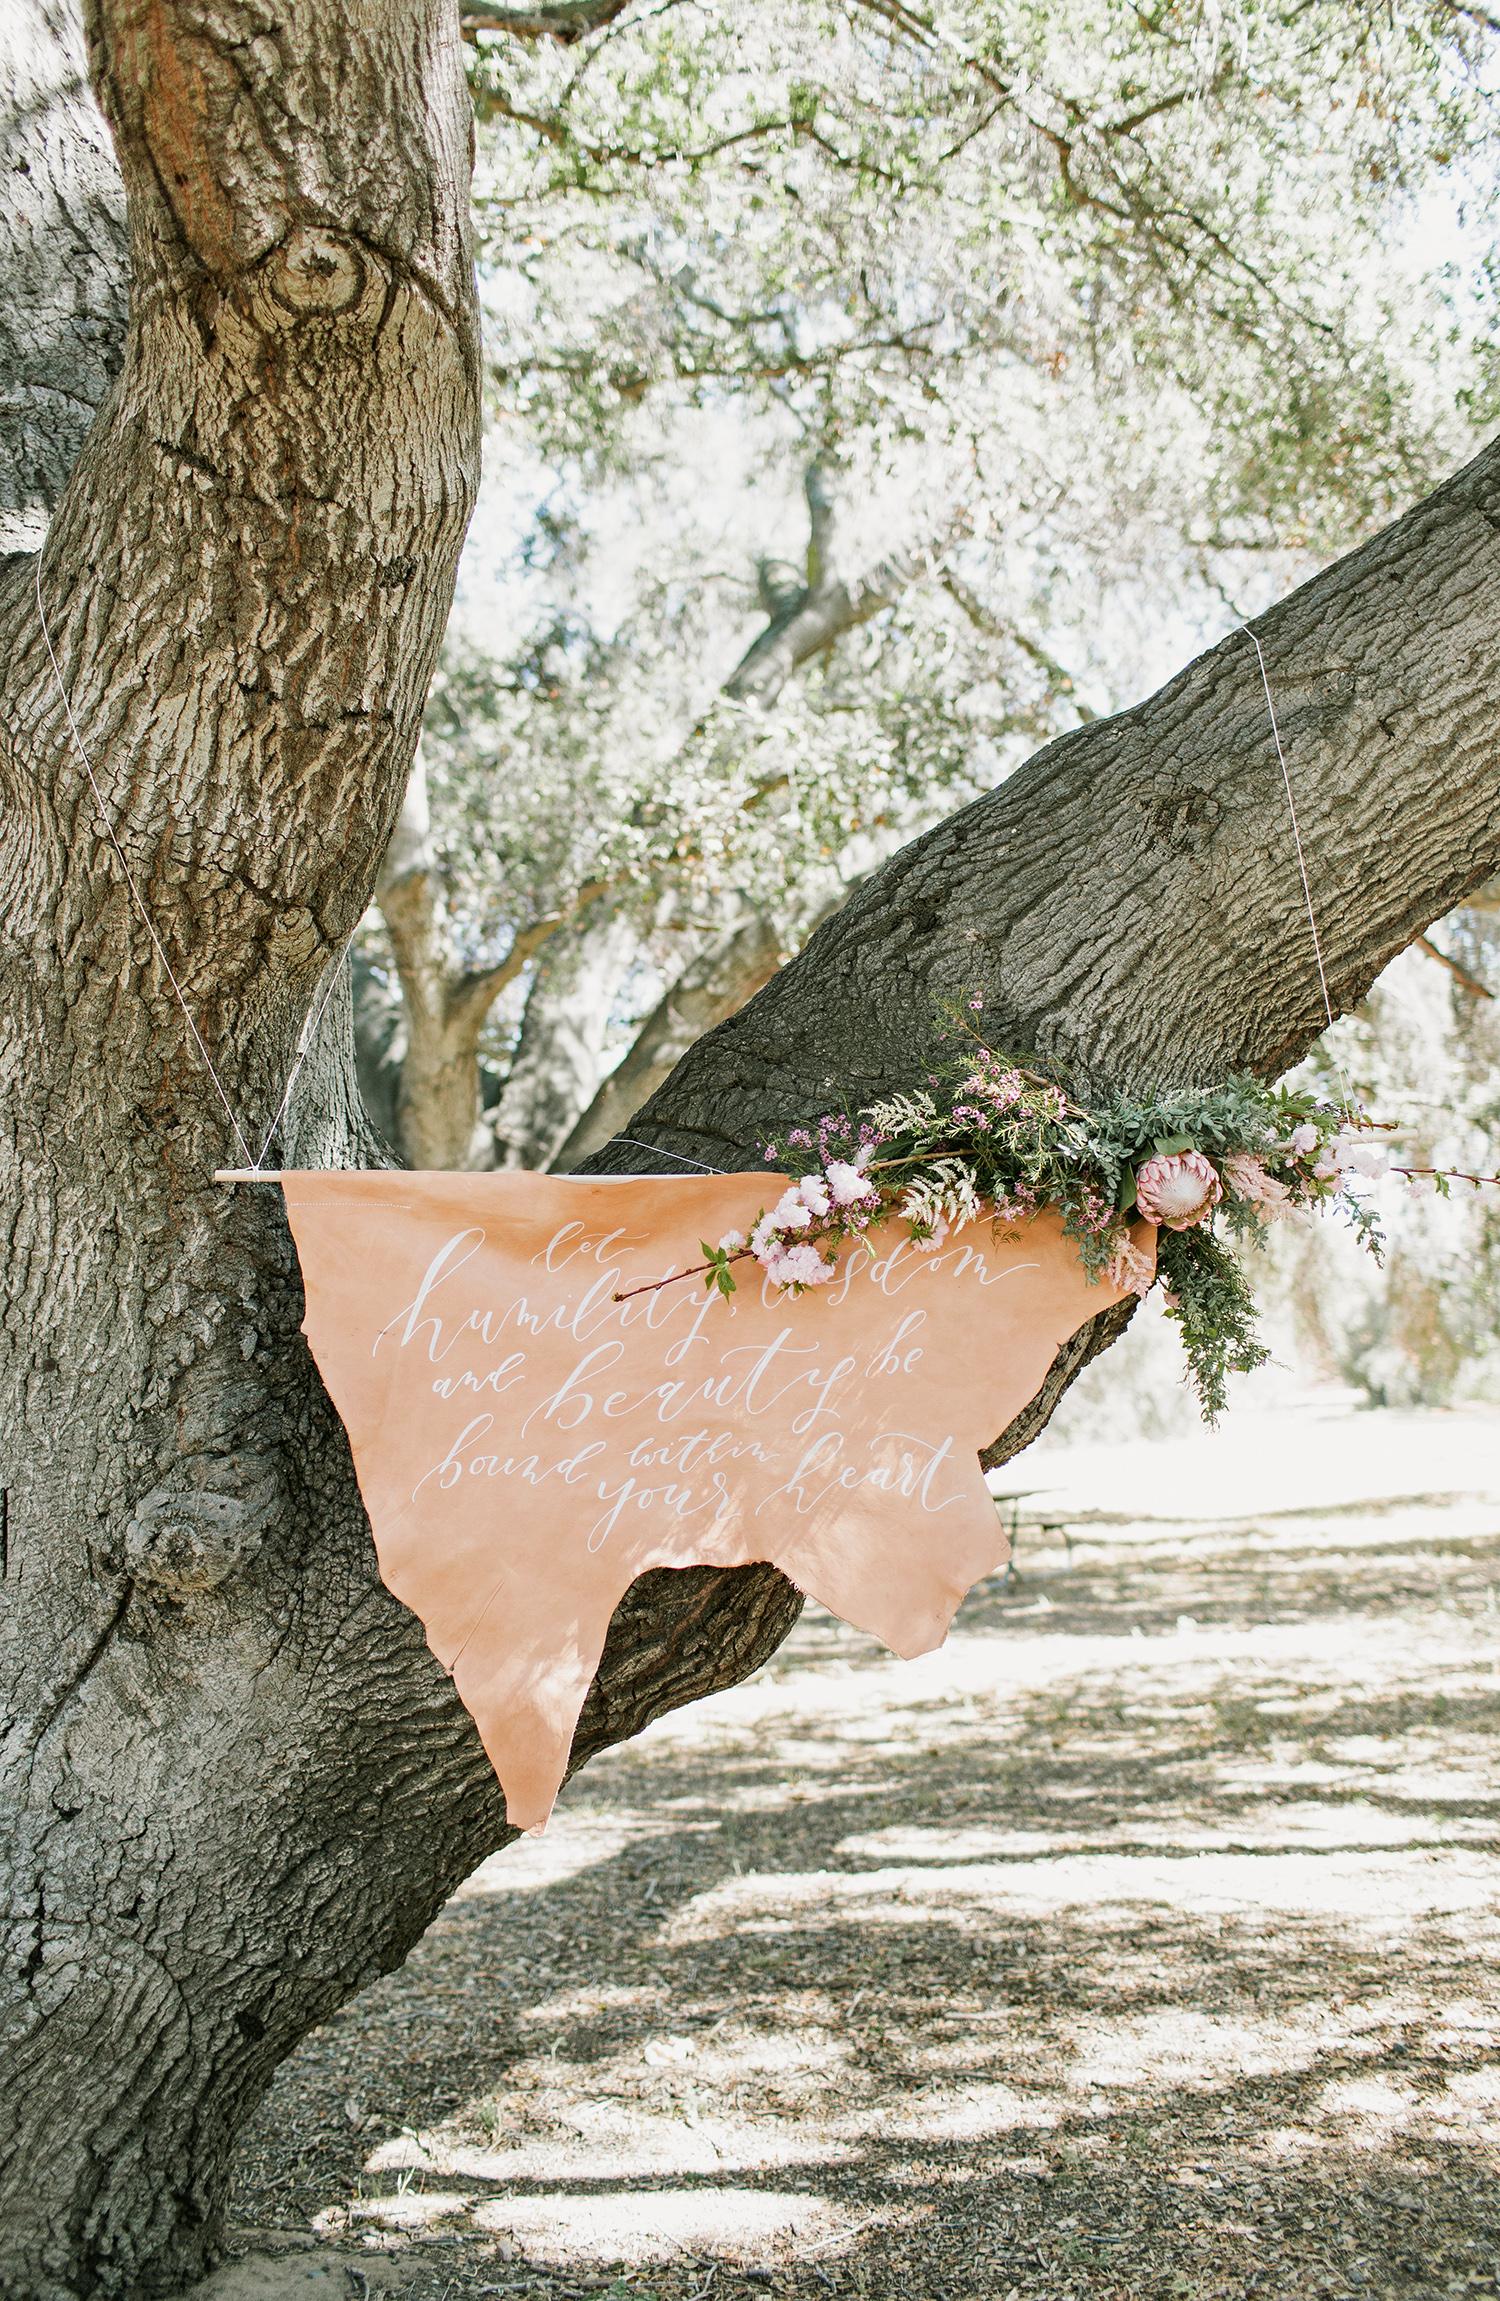 leather wedding ideas bohemian wedding sign in tree